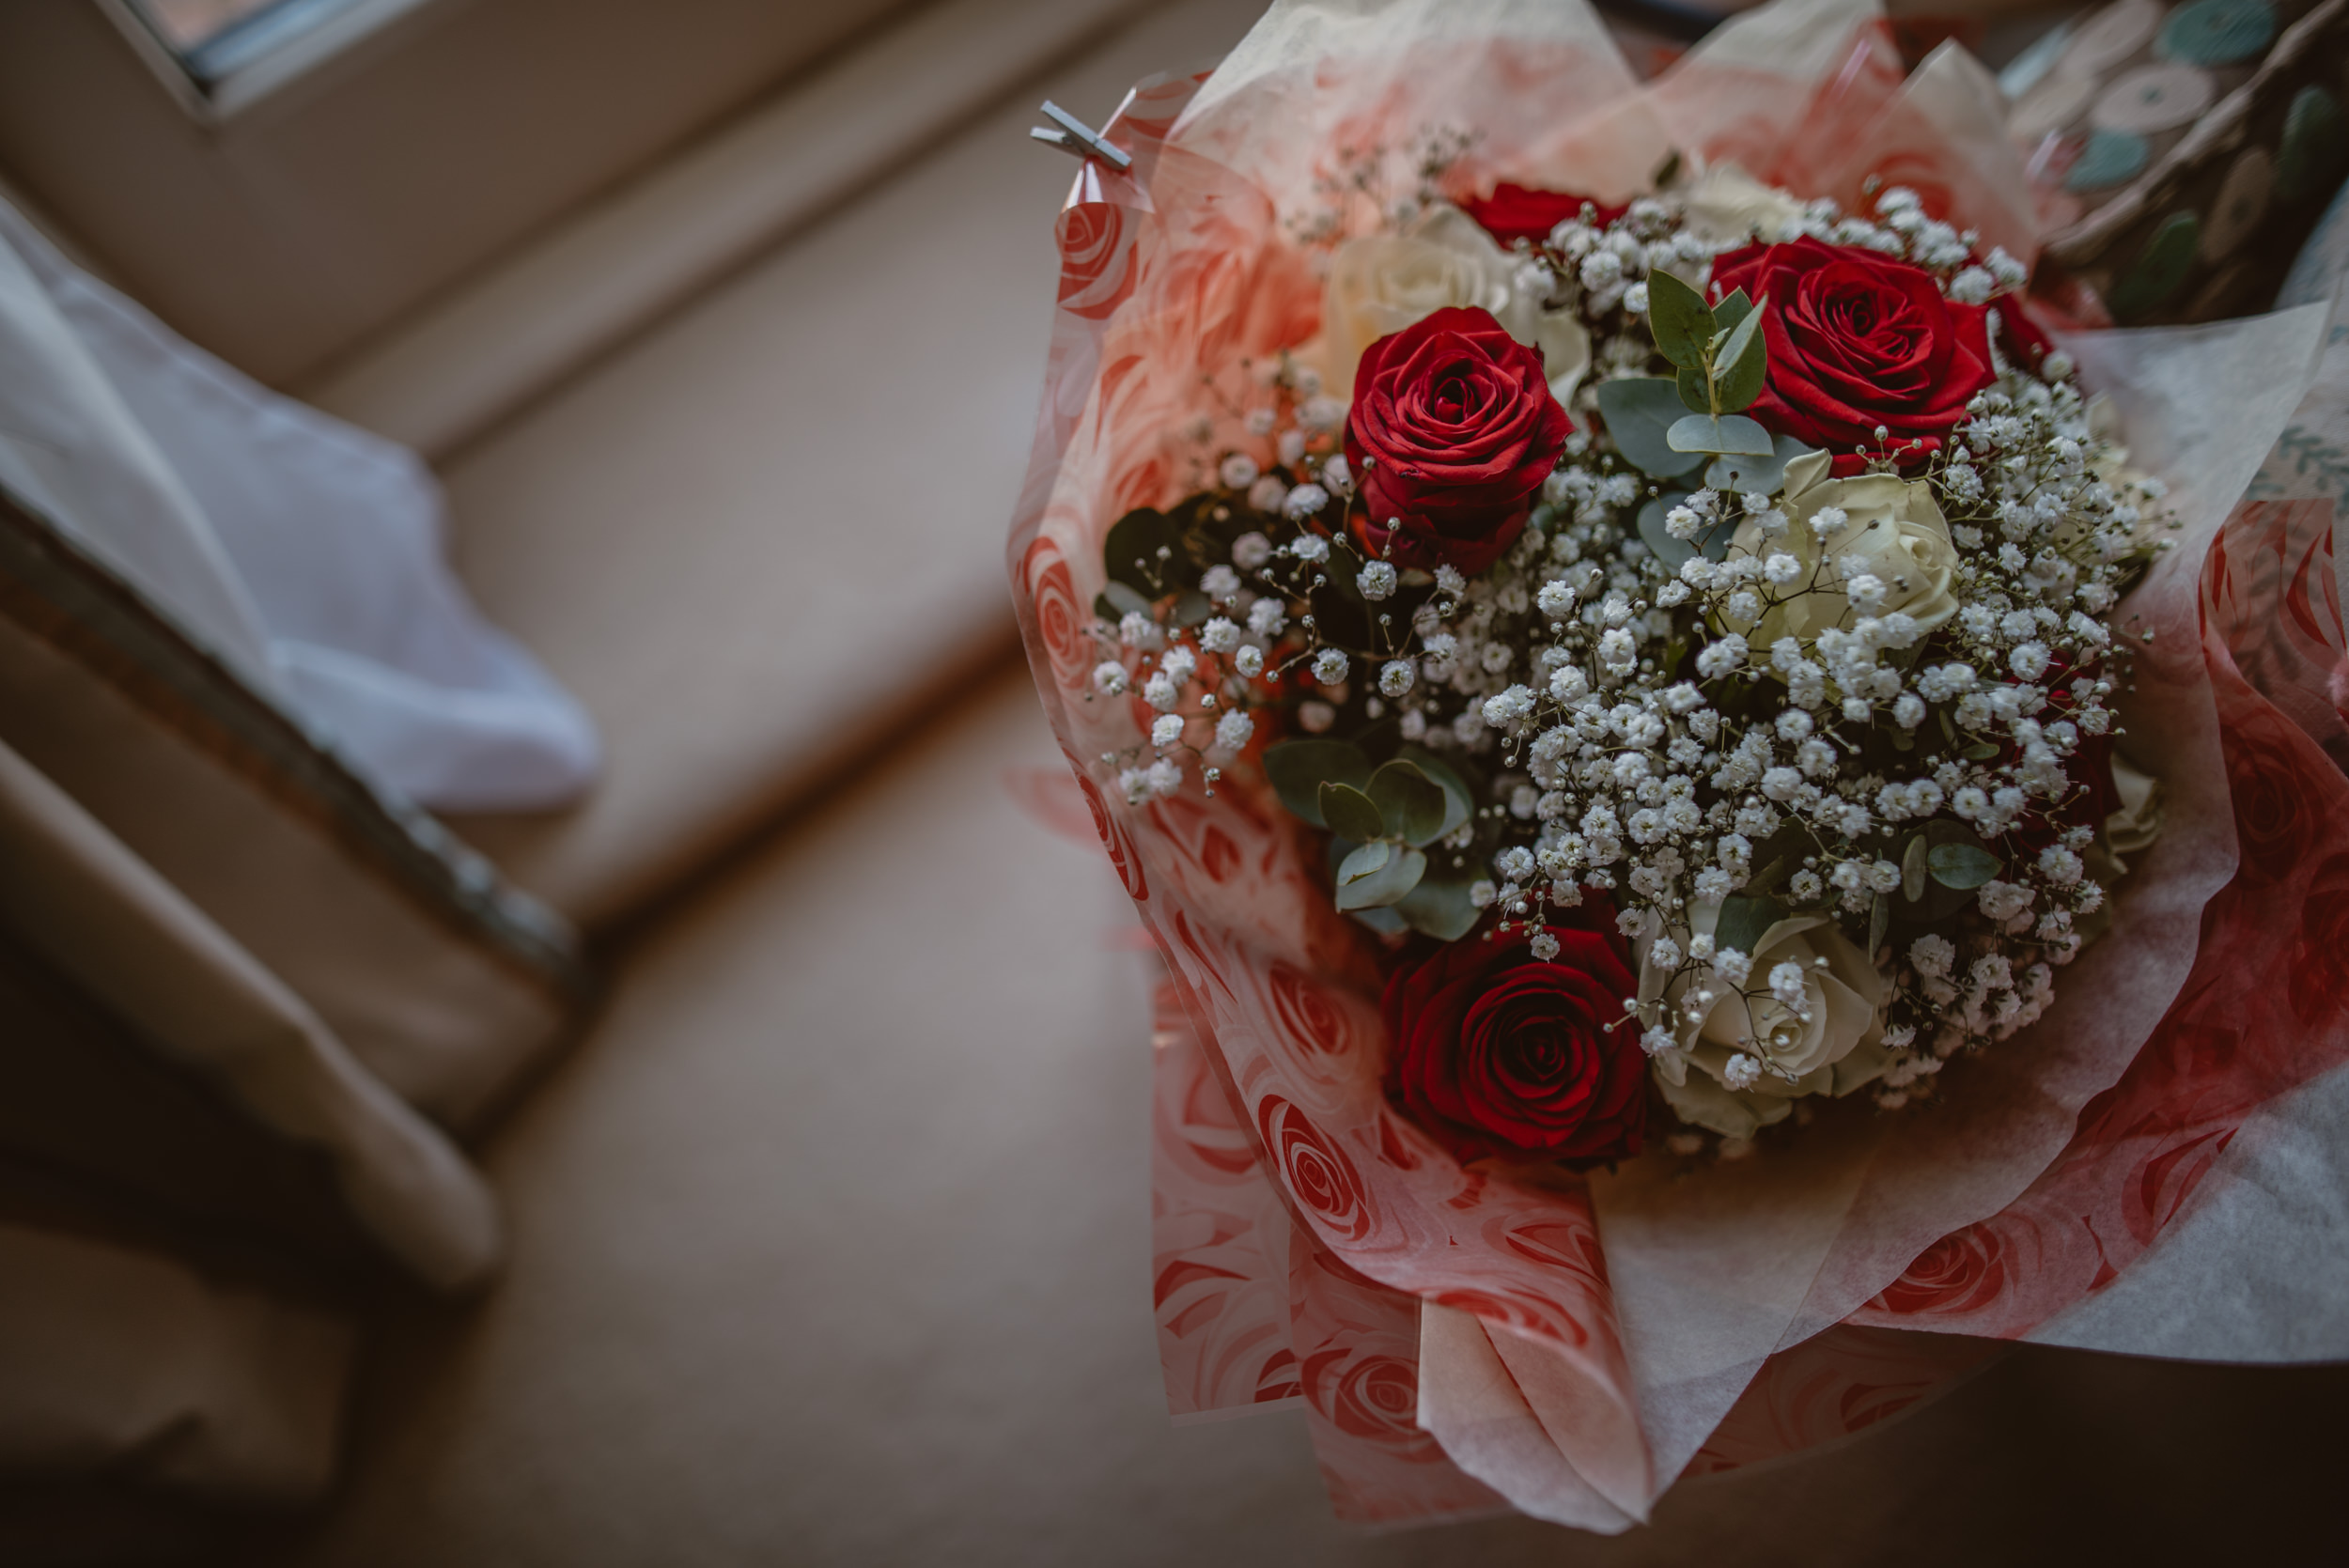 Trisha-and-Roger-wedding-The-Priory-Church-and-Chewton-Glen-Hotel-Christchurch-Manu-Mendoza-Wedding-Photography-009.jpg